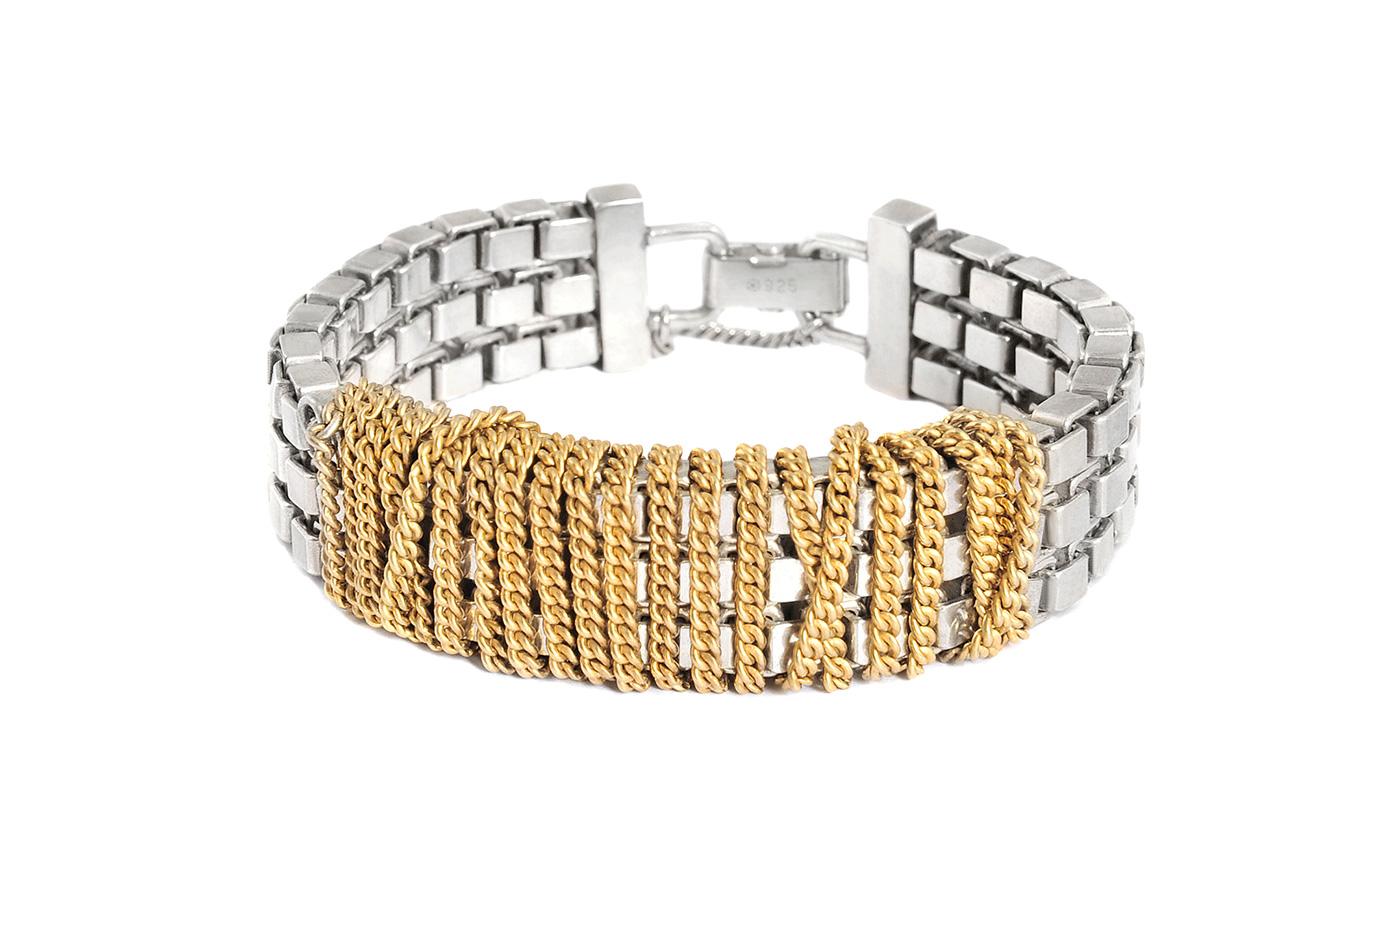 Adeline Cacheux Jewelry Design Bracelet chaîne torsadée argent massif